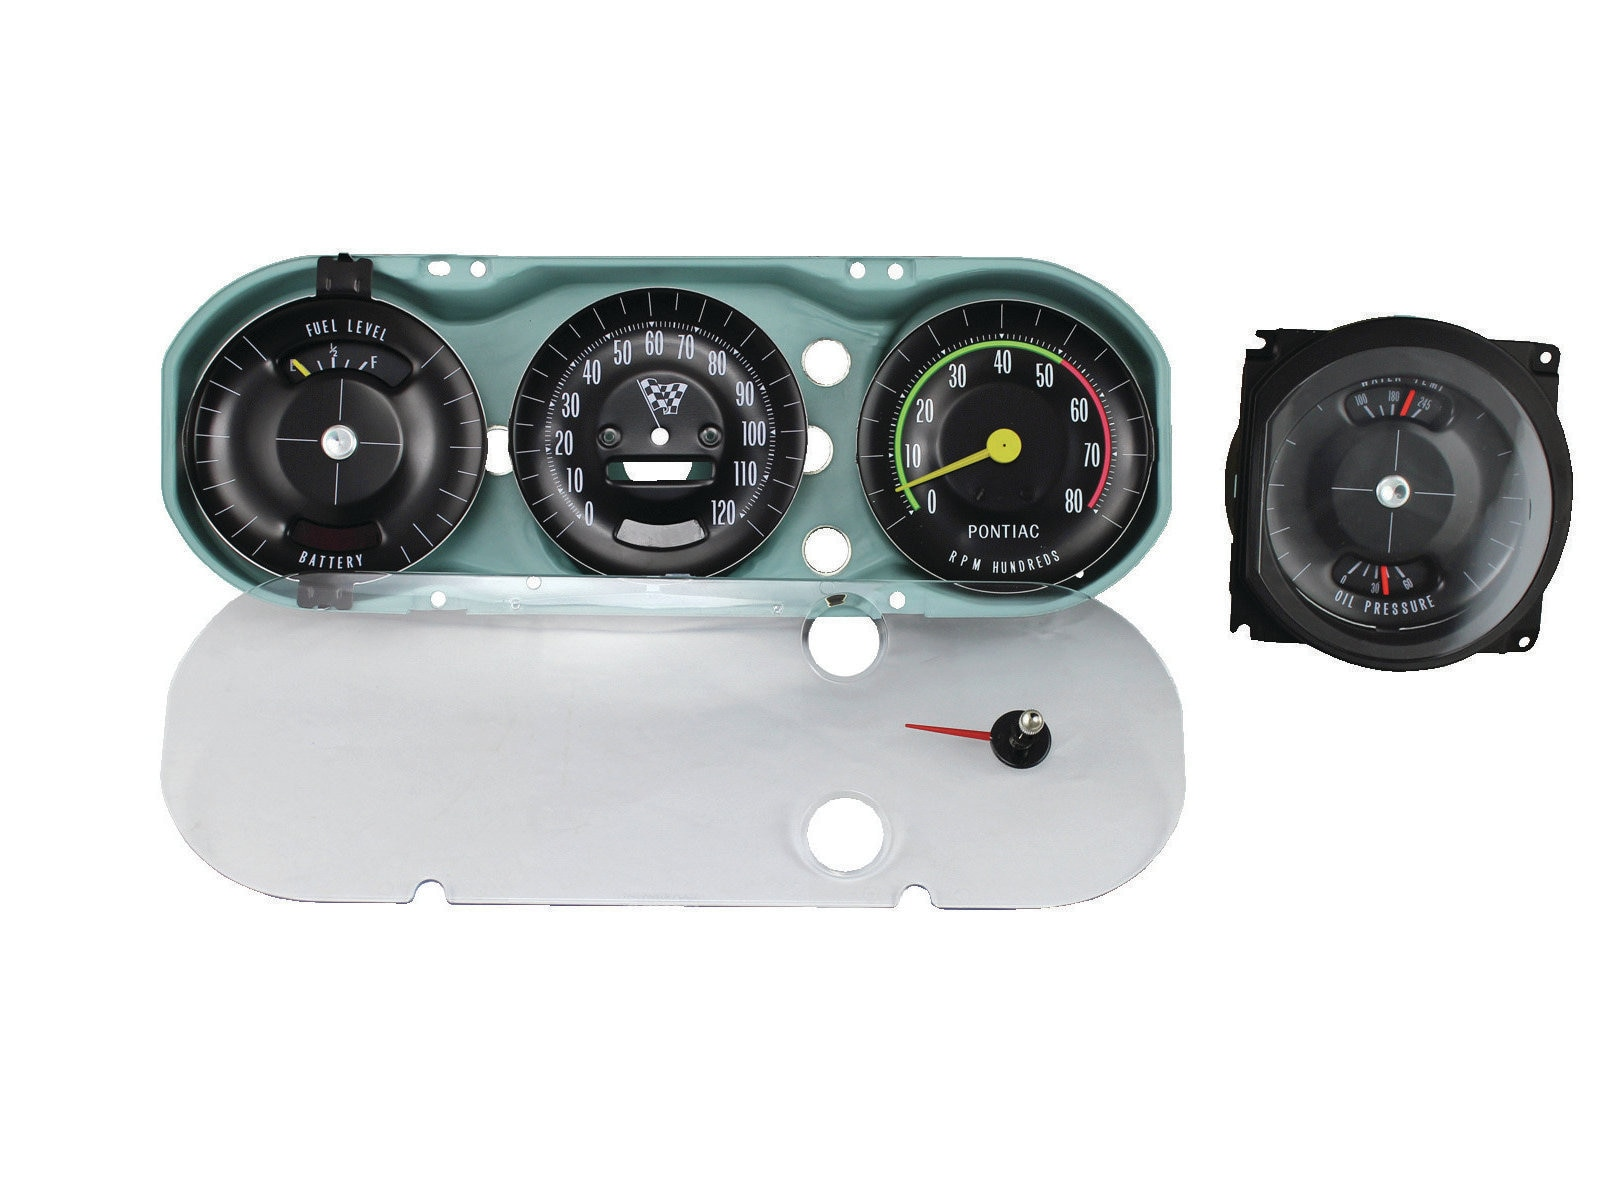 medium resolution of 1967 gto rally gauge wiring diagram wiring 1964 pontiac gto wiring diagram 67 gto rally